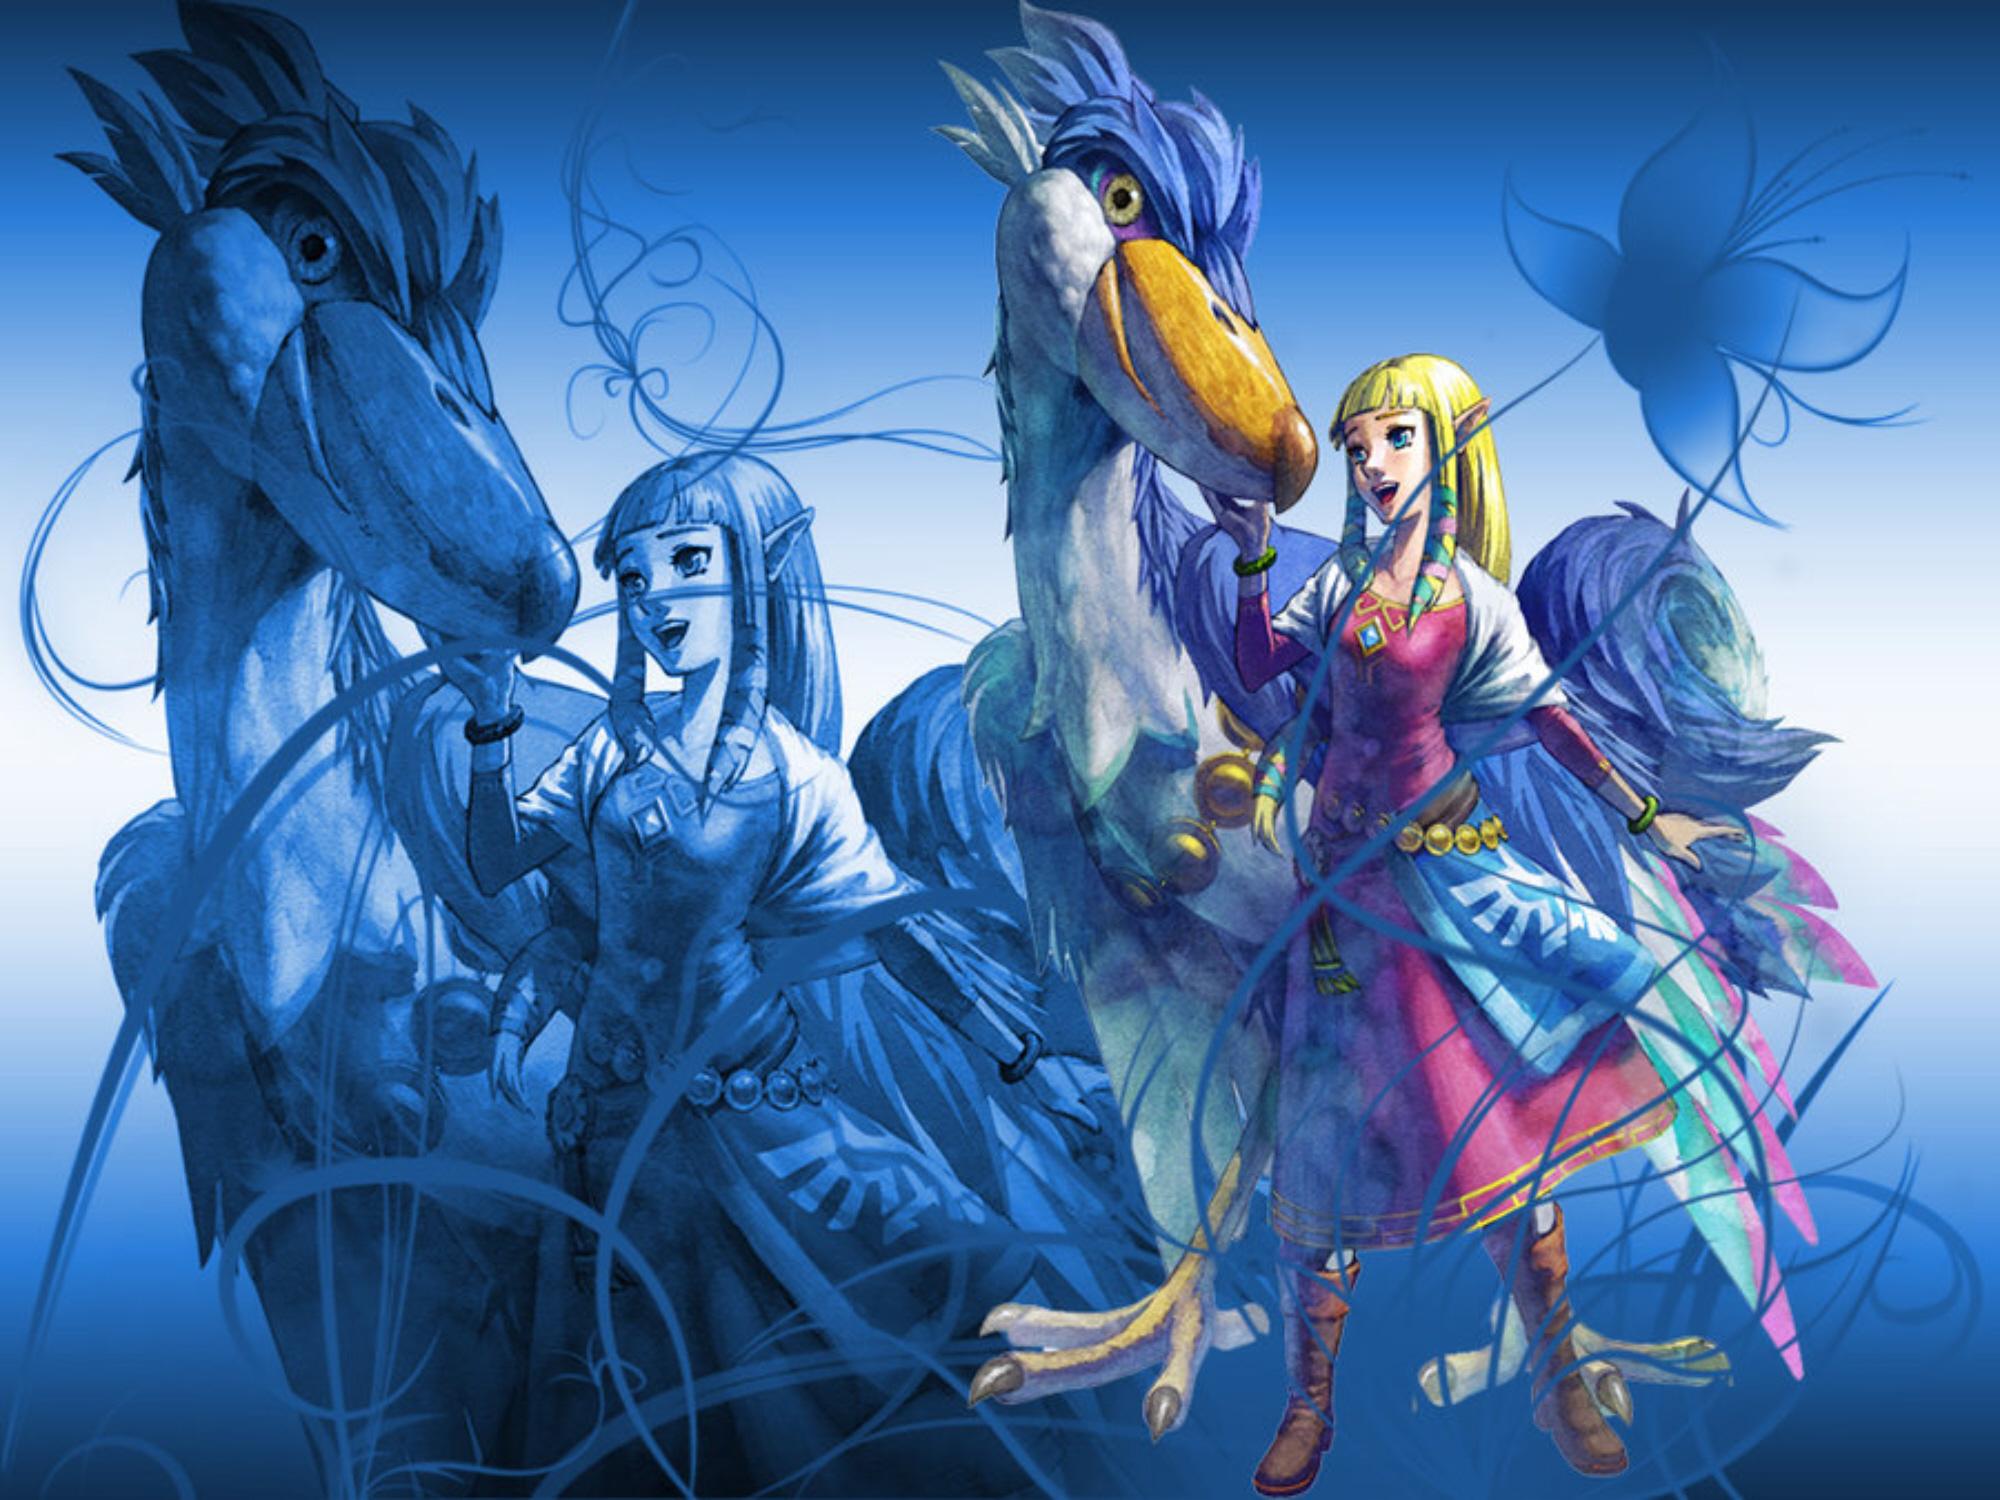 Anime Girl Epic Wallpapers Zelda Skyward Sword Wallpapers